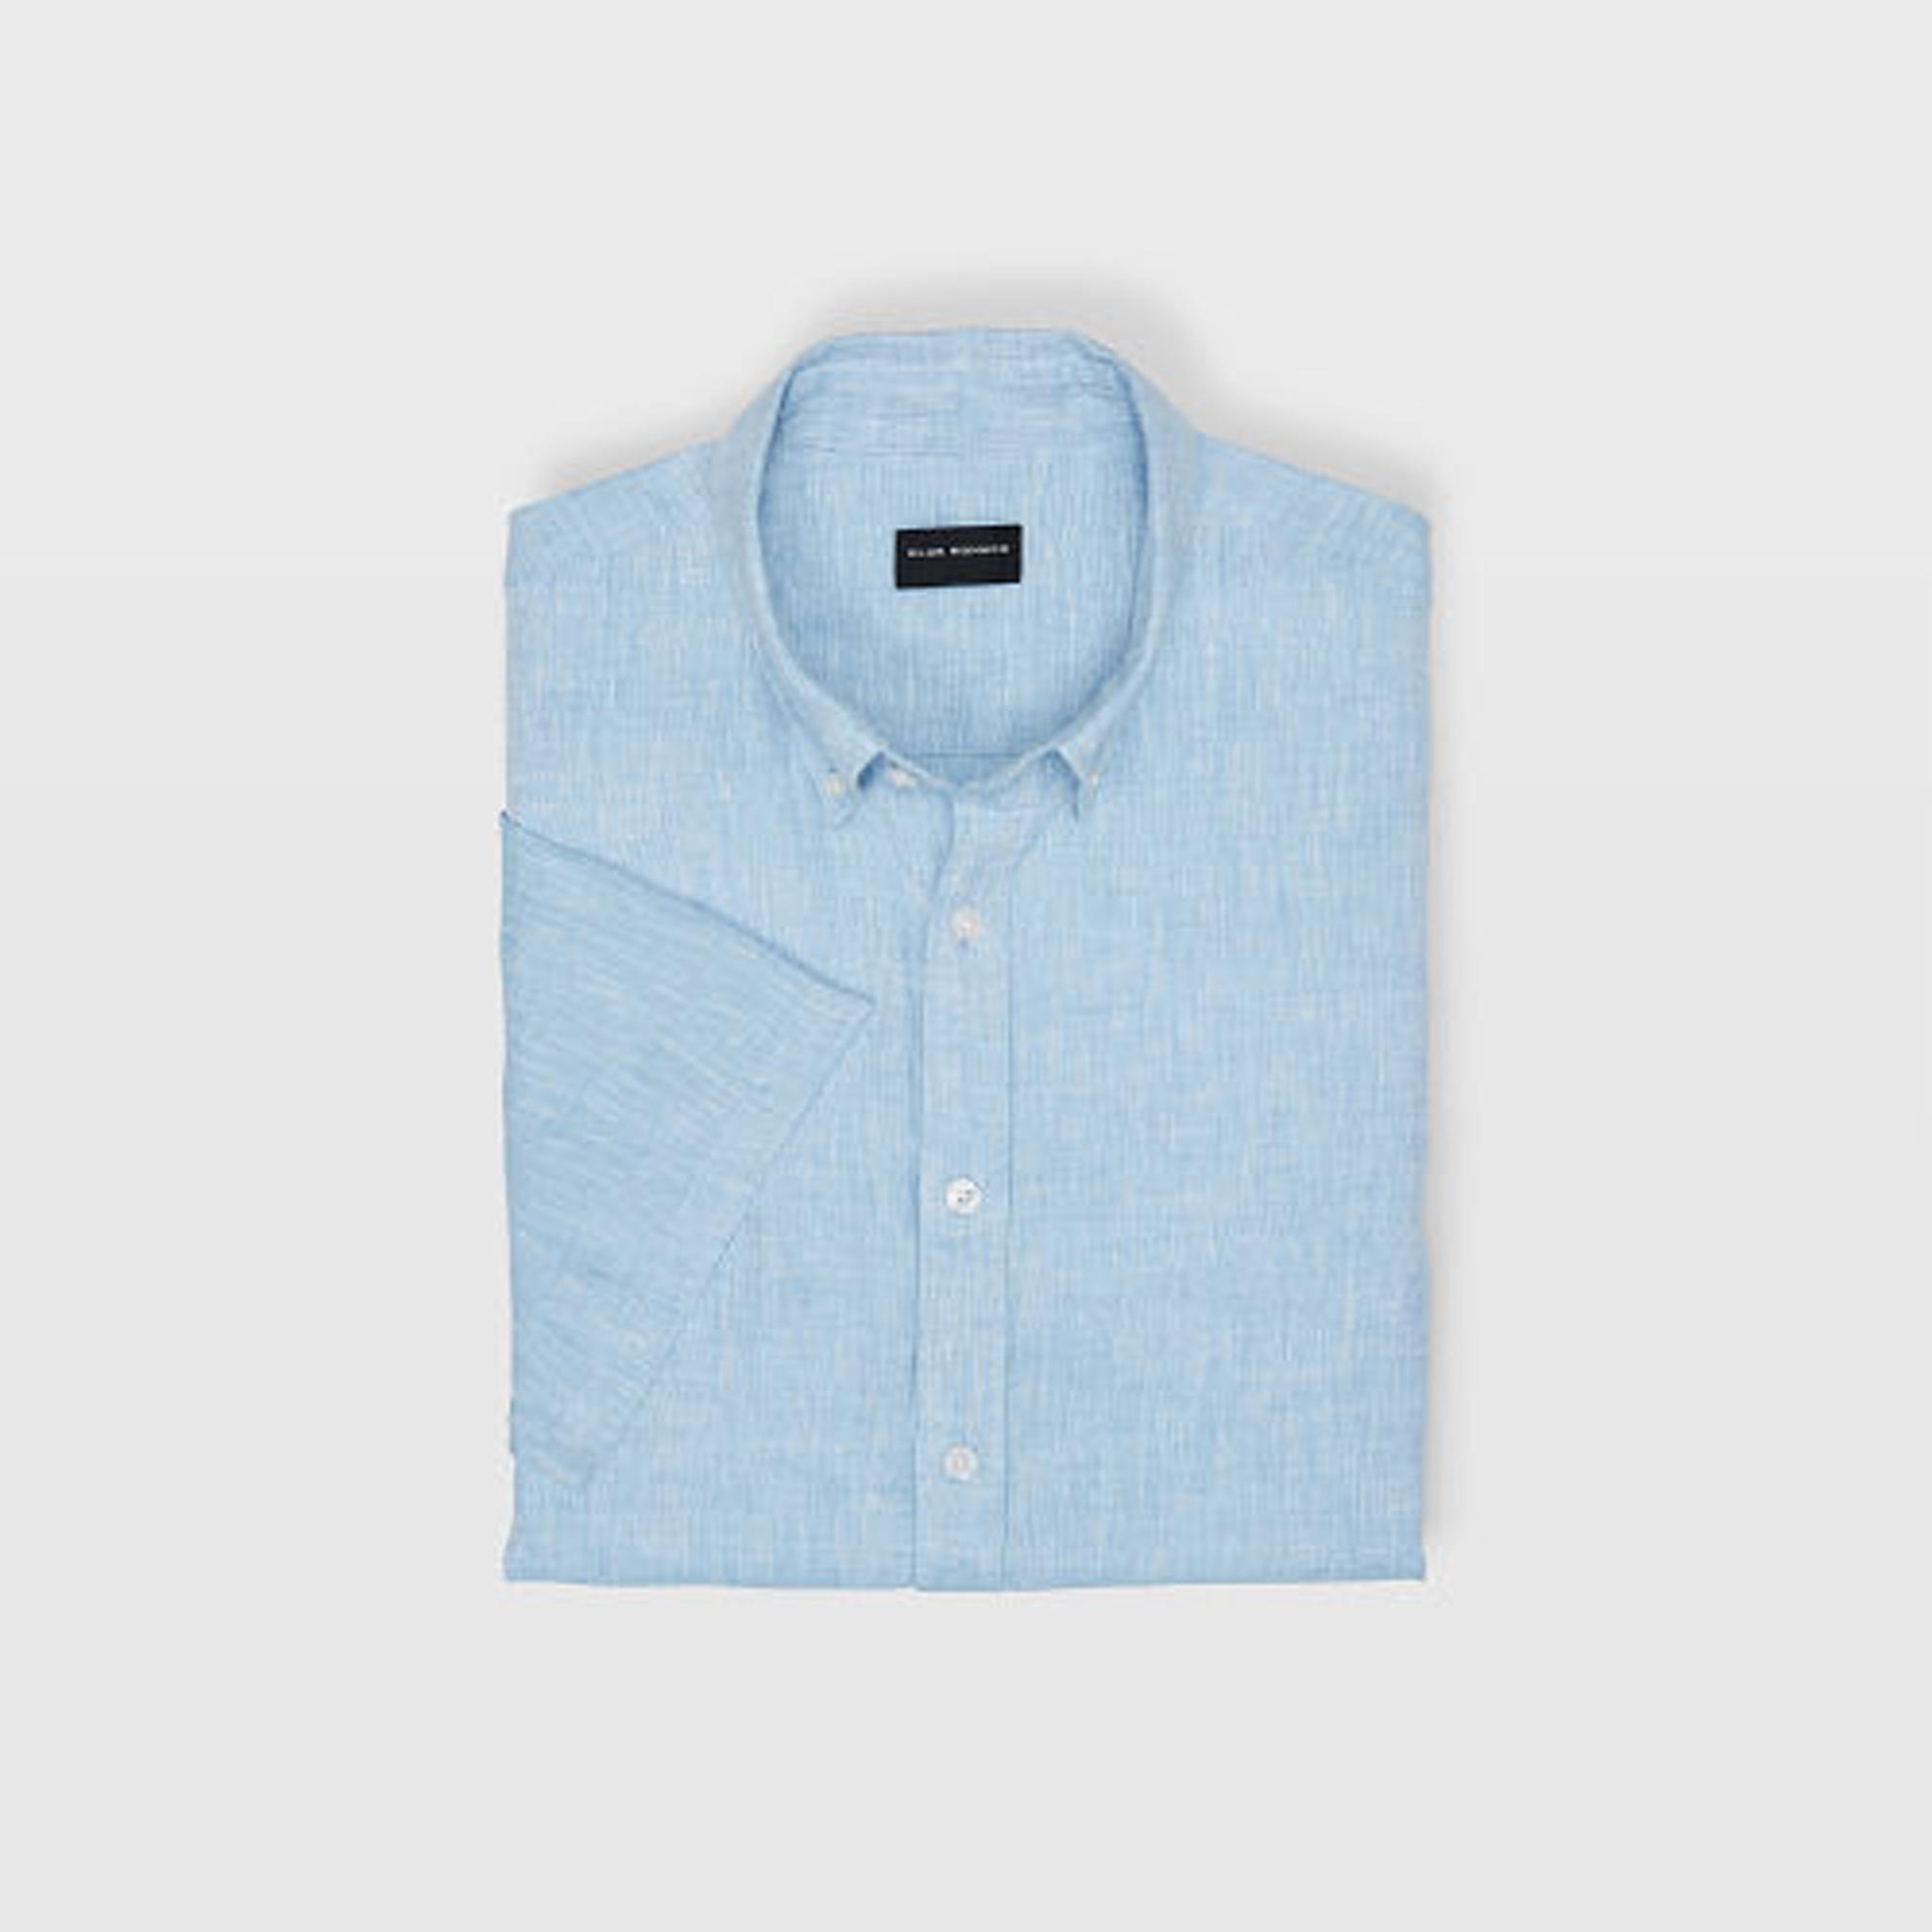 Slim Cross Dye Linen Shirt   HK$1,090